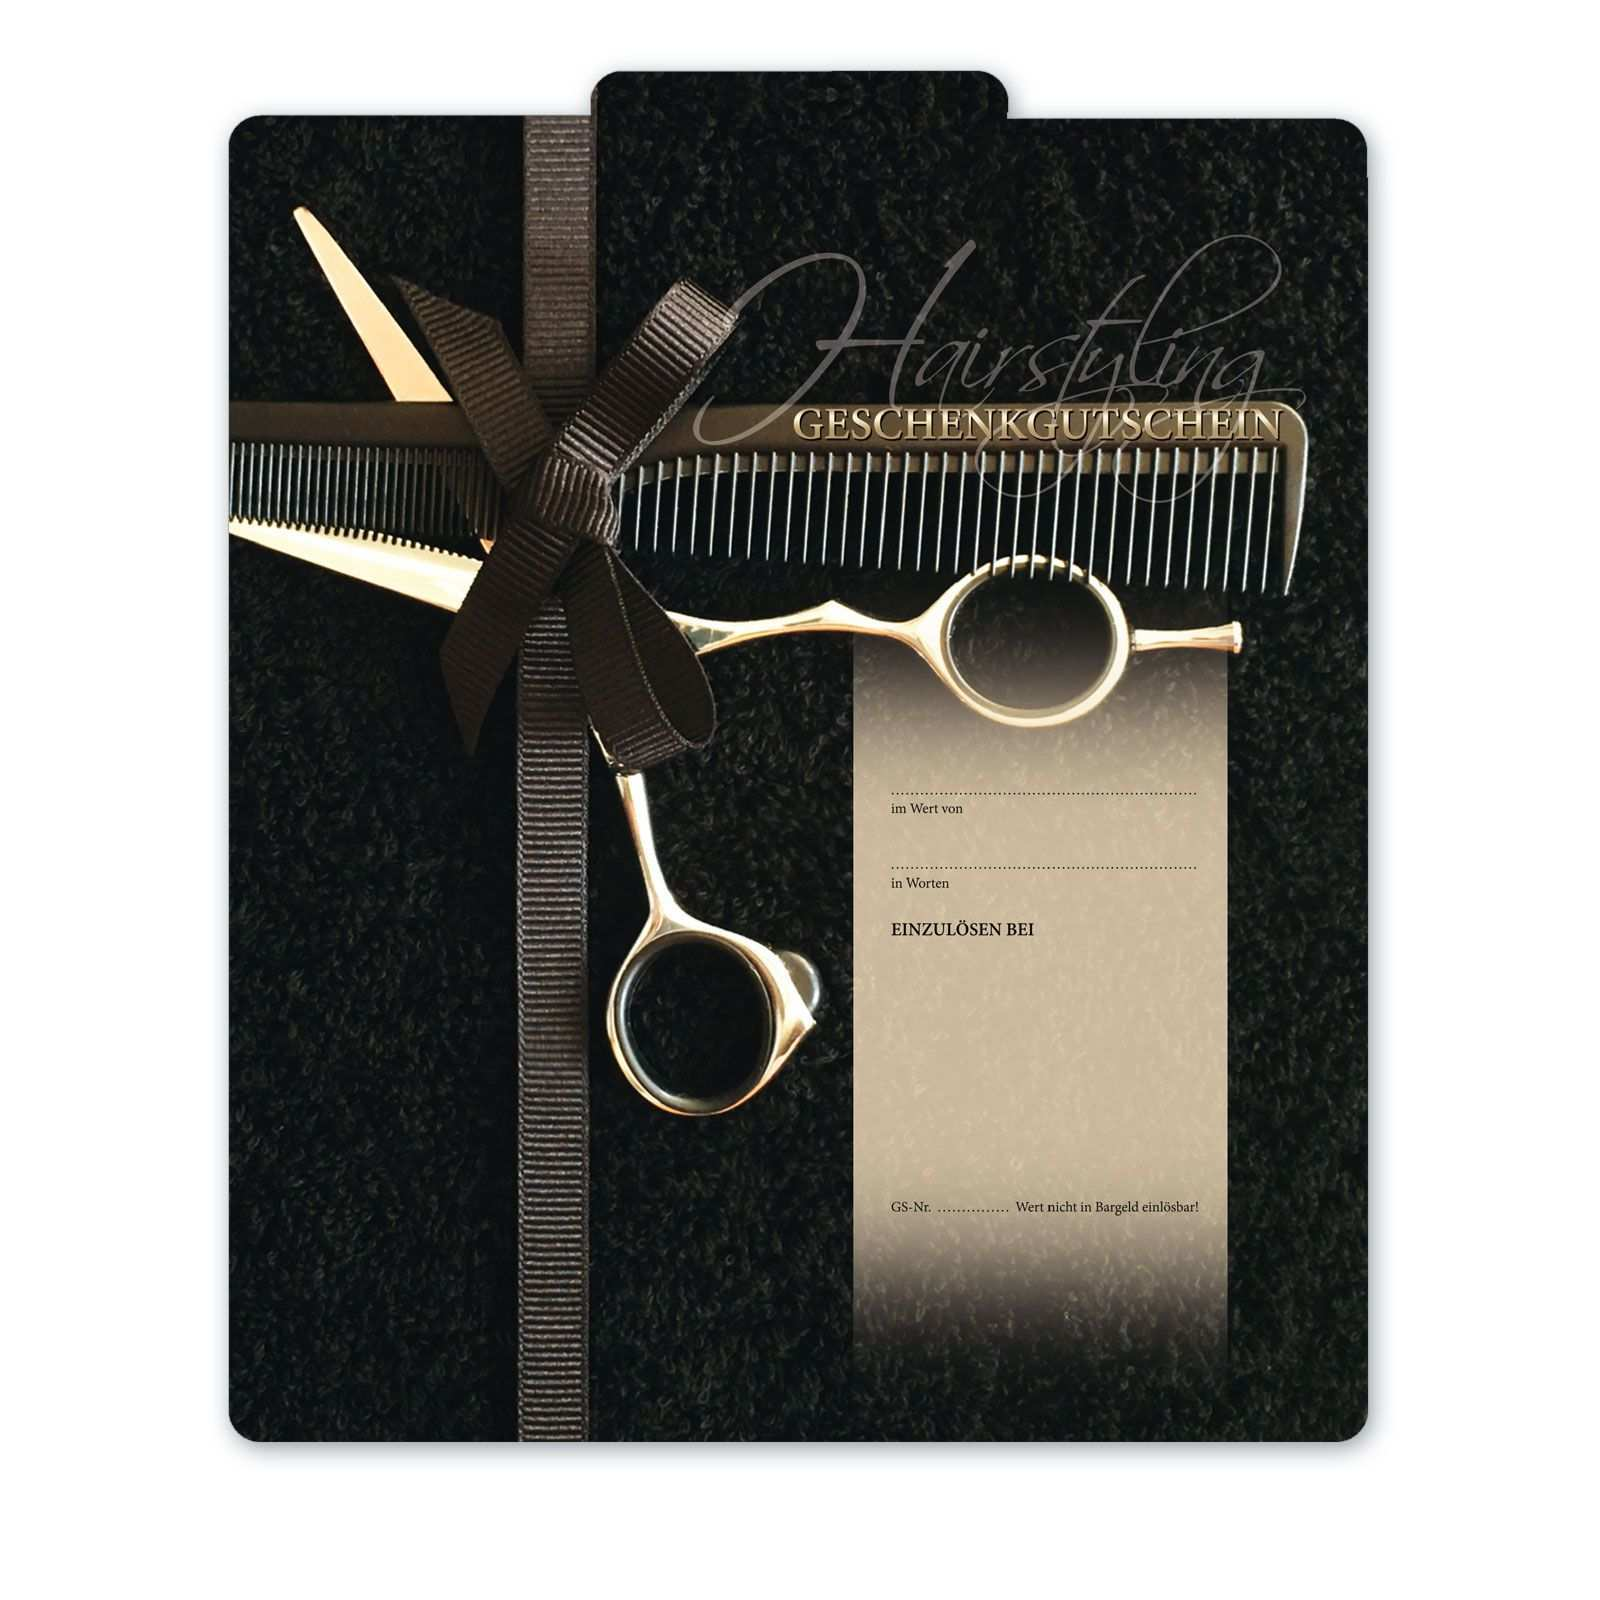 Geschenkgutschein Fur Friseure K292 Geschenkgutscheine Gutschein Basteln Friseur Gutscheine